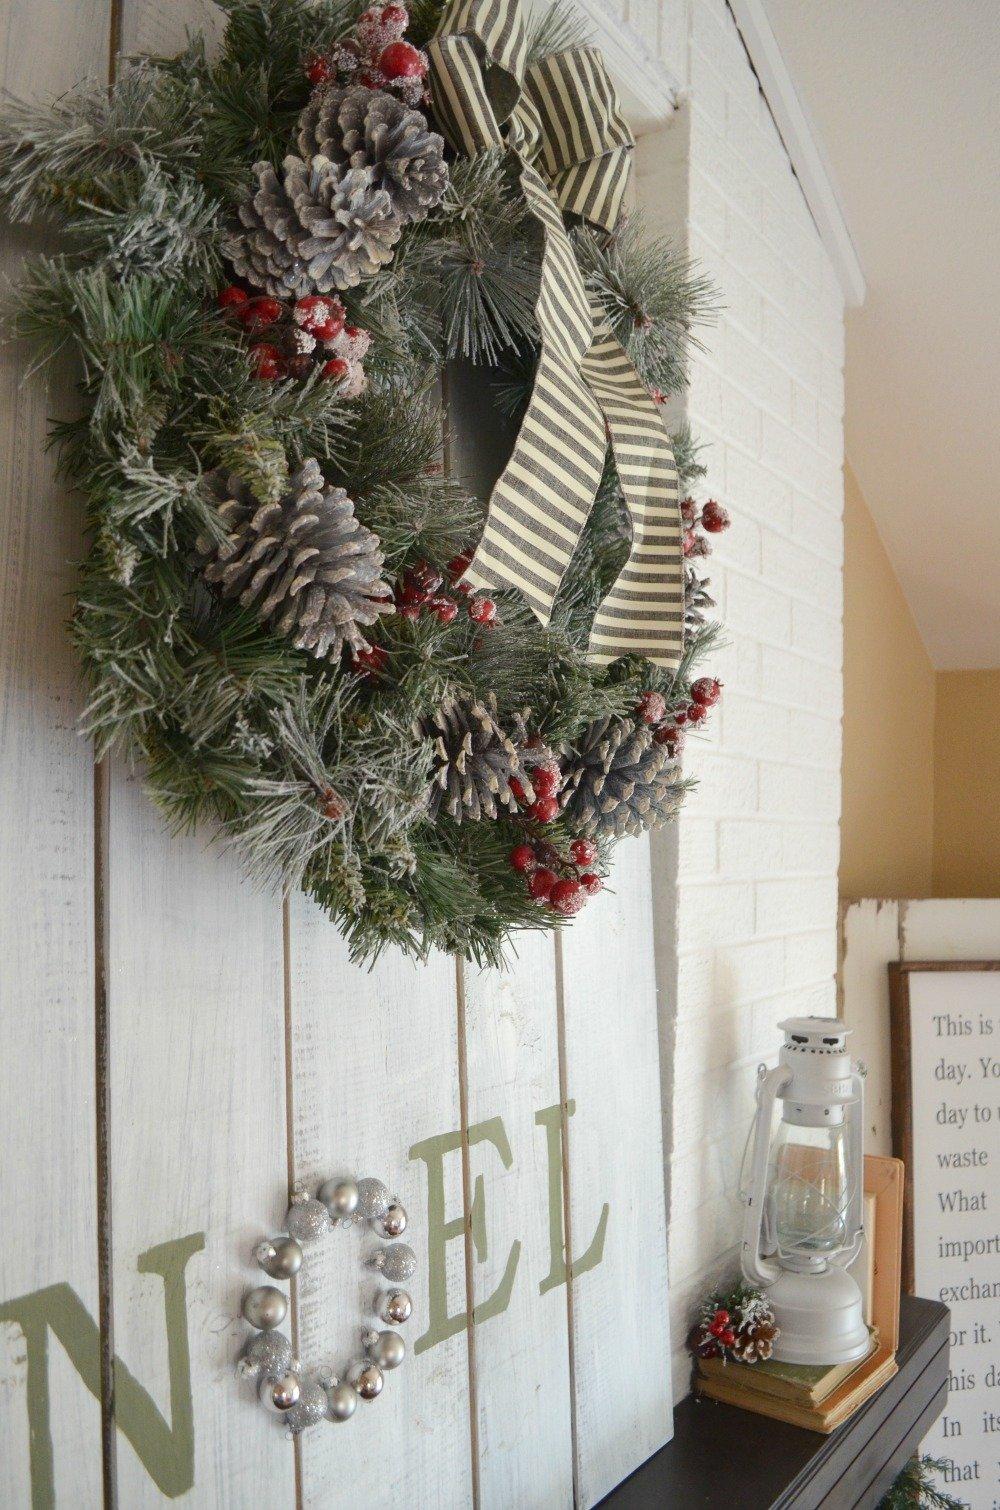 DIY Holiday Ornament Display